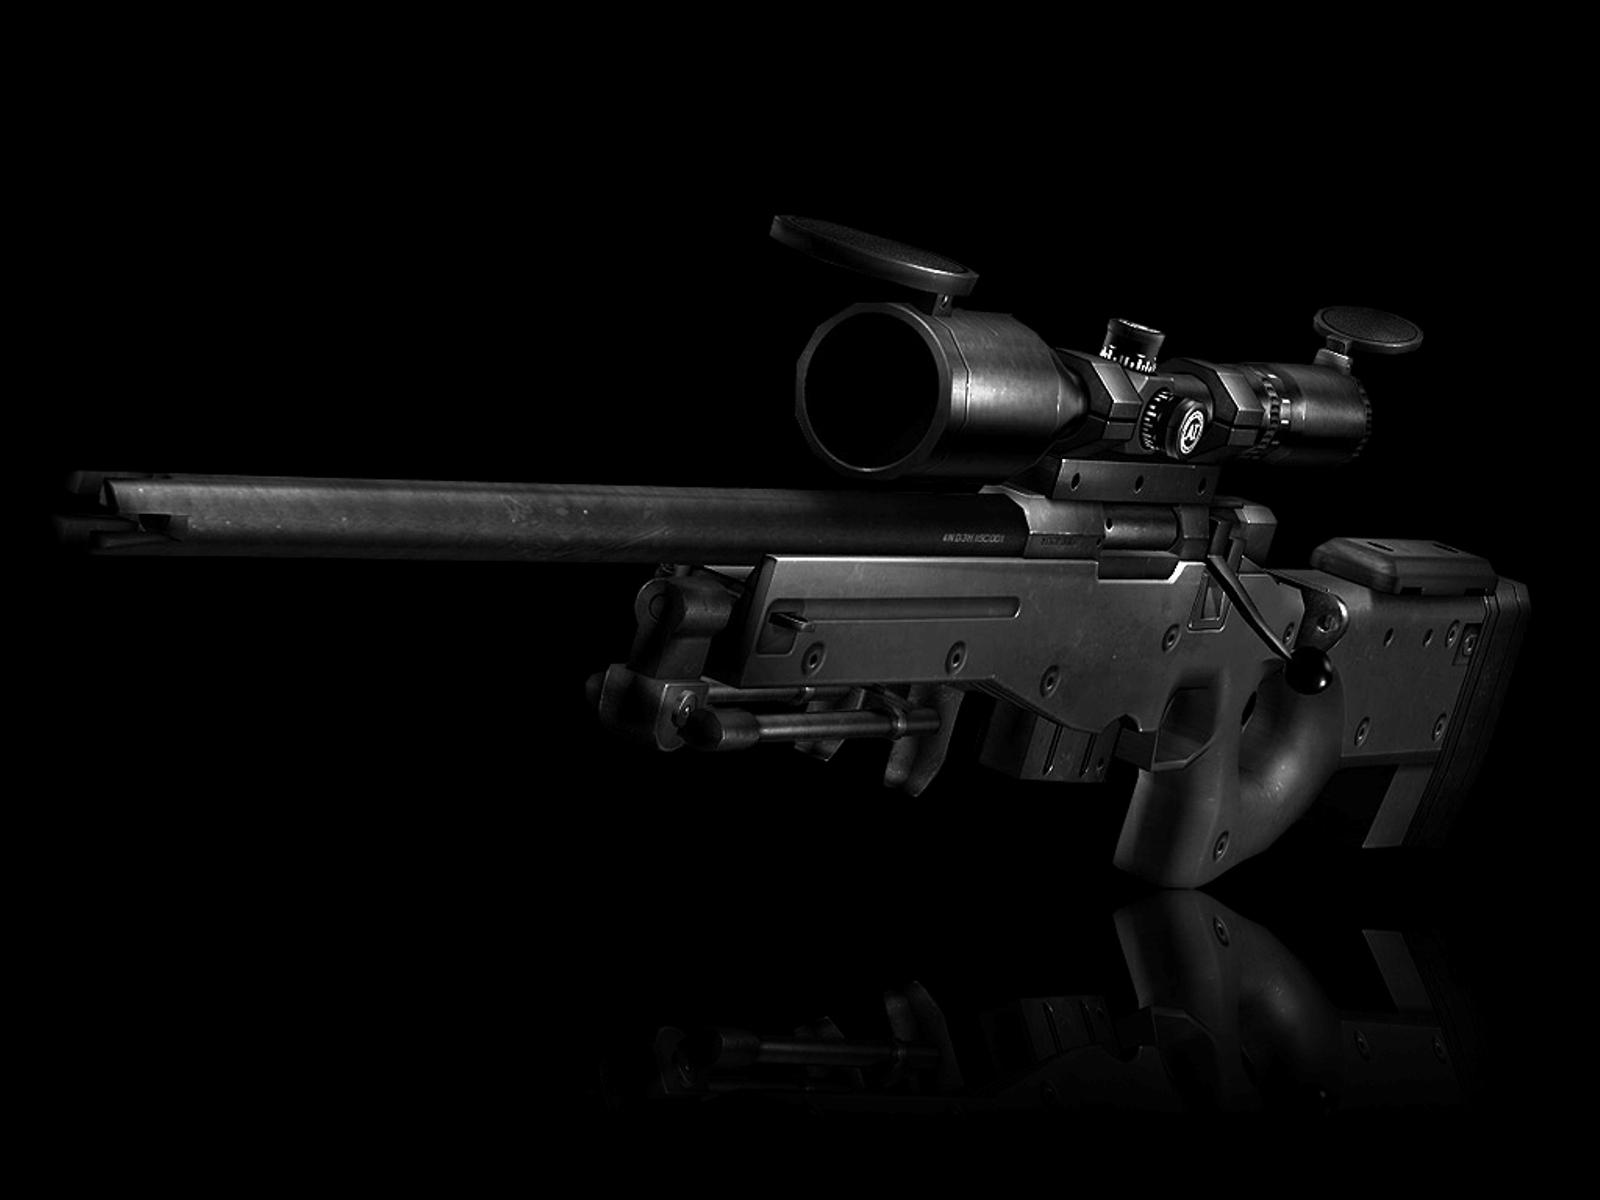 Sniper Rifle Computer Wallpapers Desktop Backgrounds 1600x1200 ID 1600x1200